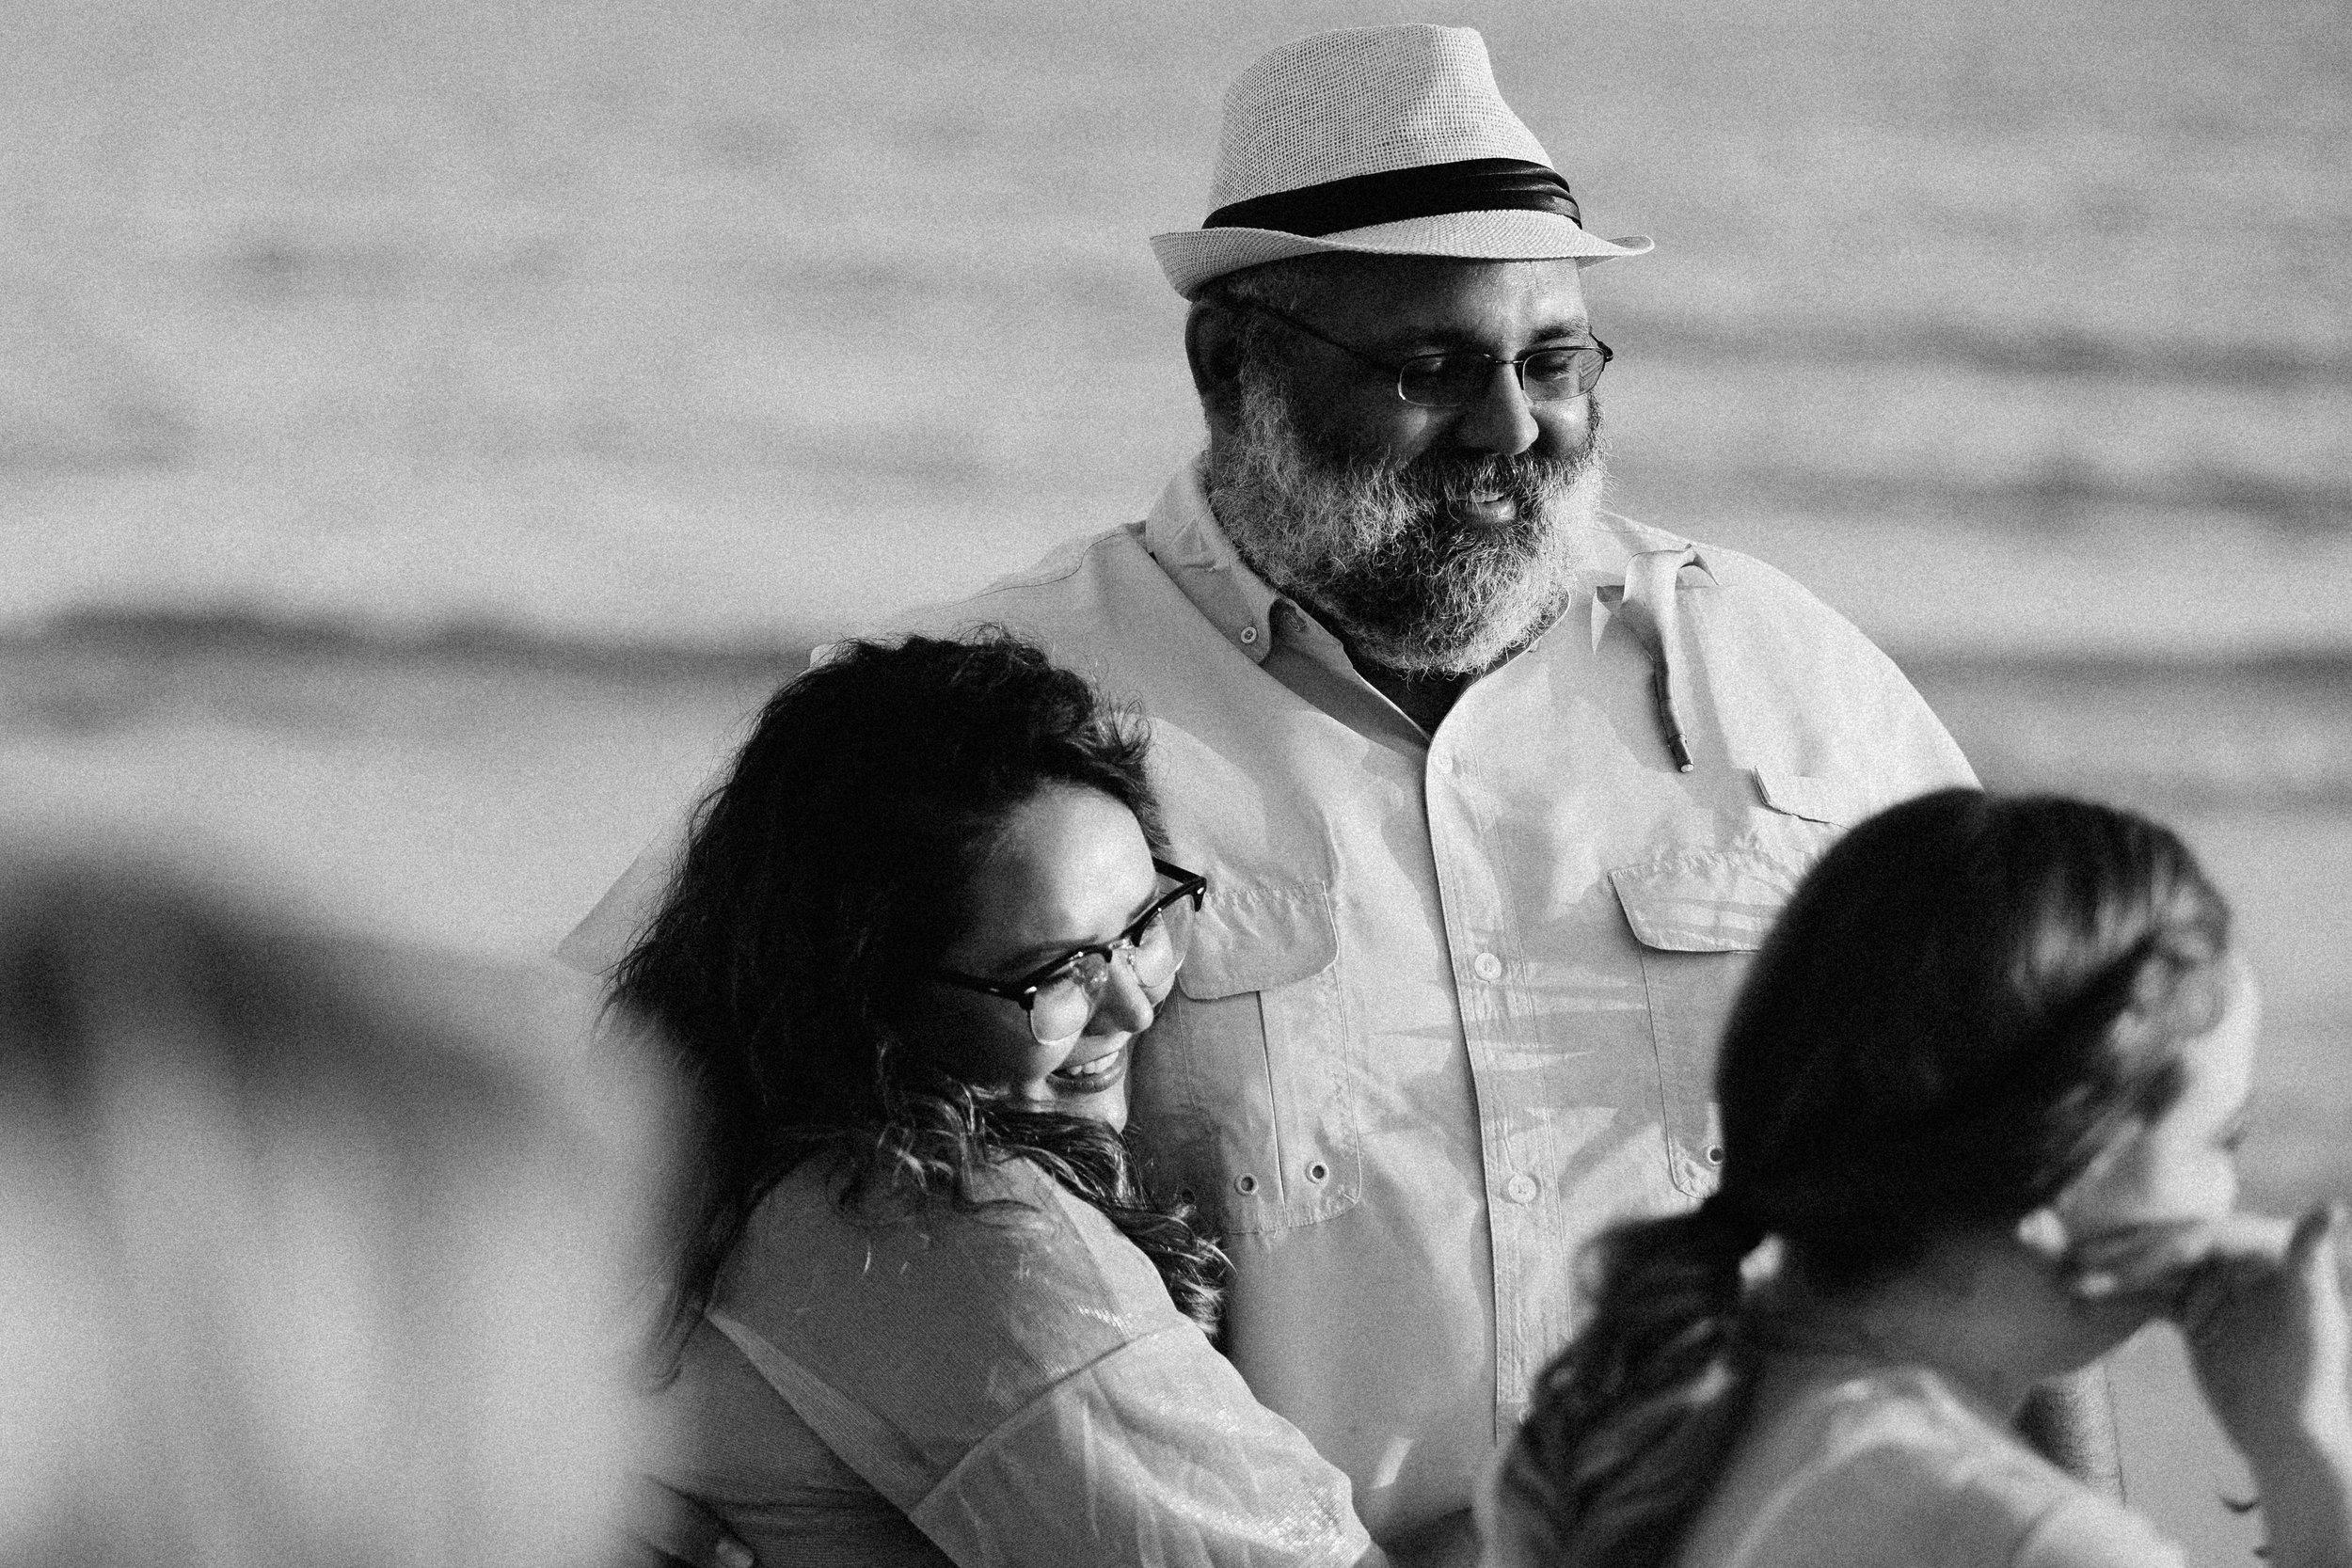 destin_sunset_beach_elopement_intimate_wedding_photographer_florida_documentary_1229.jpg